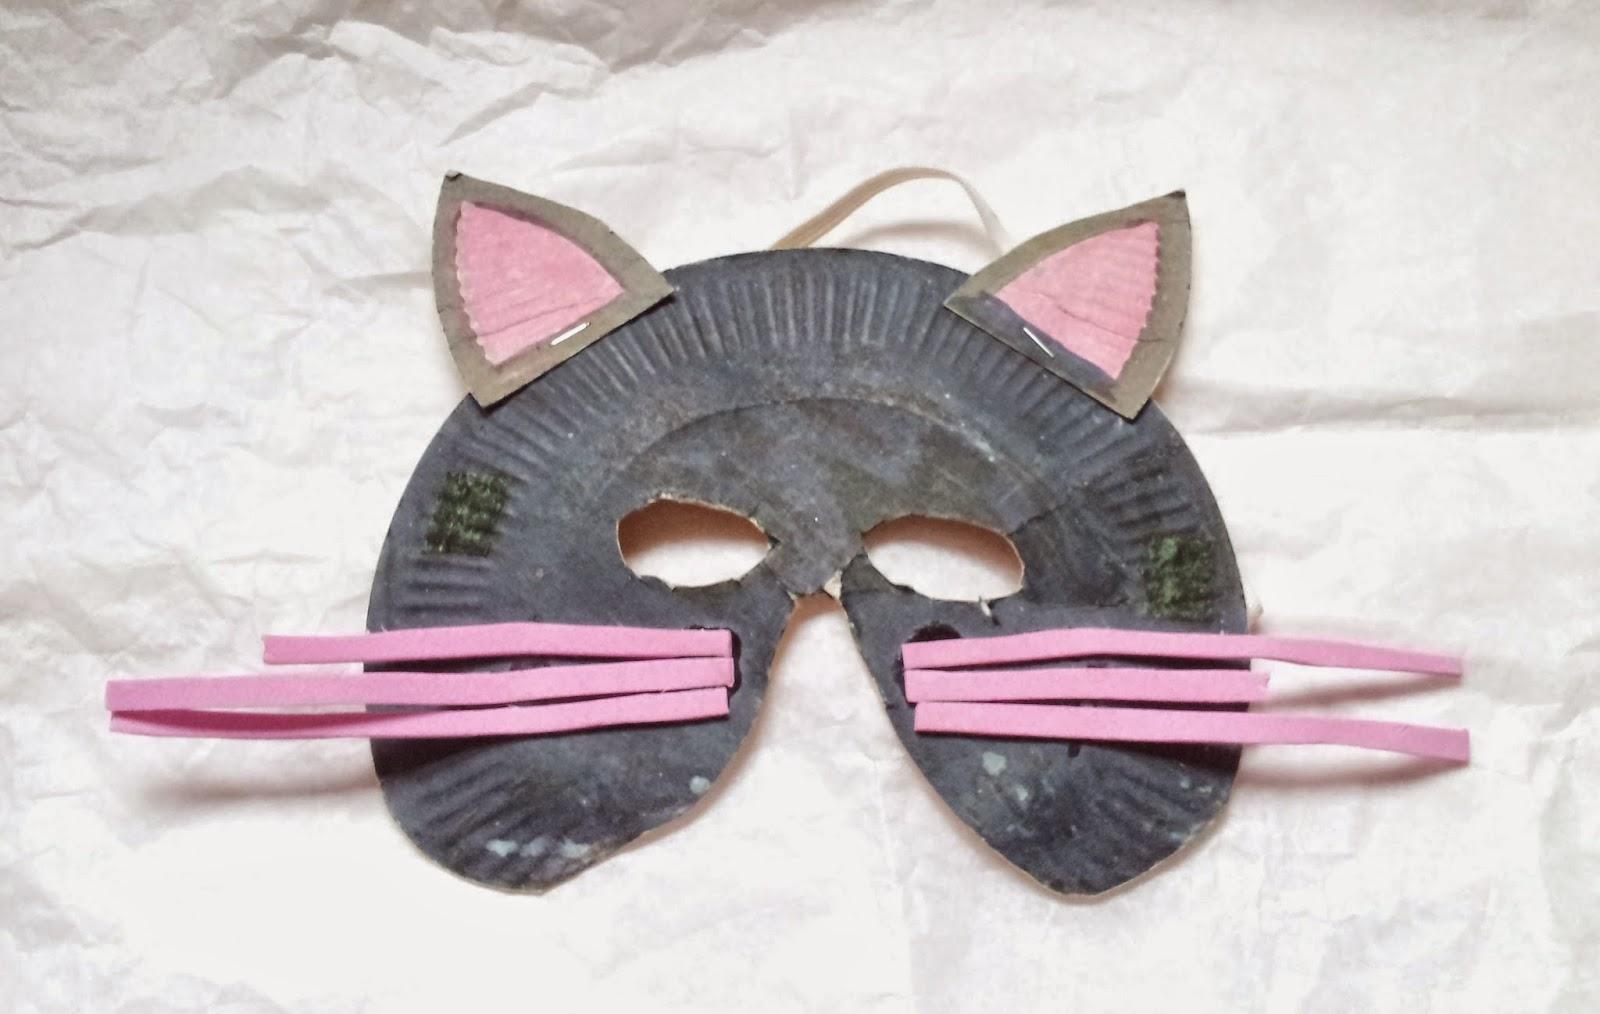 Bulles de plume diy masques carnaval - Masque de carnaval a fabriquer ...